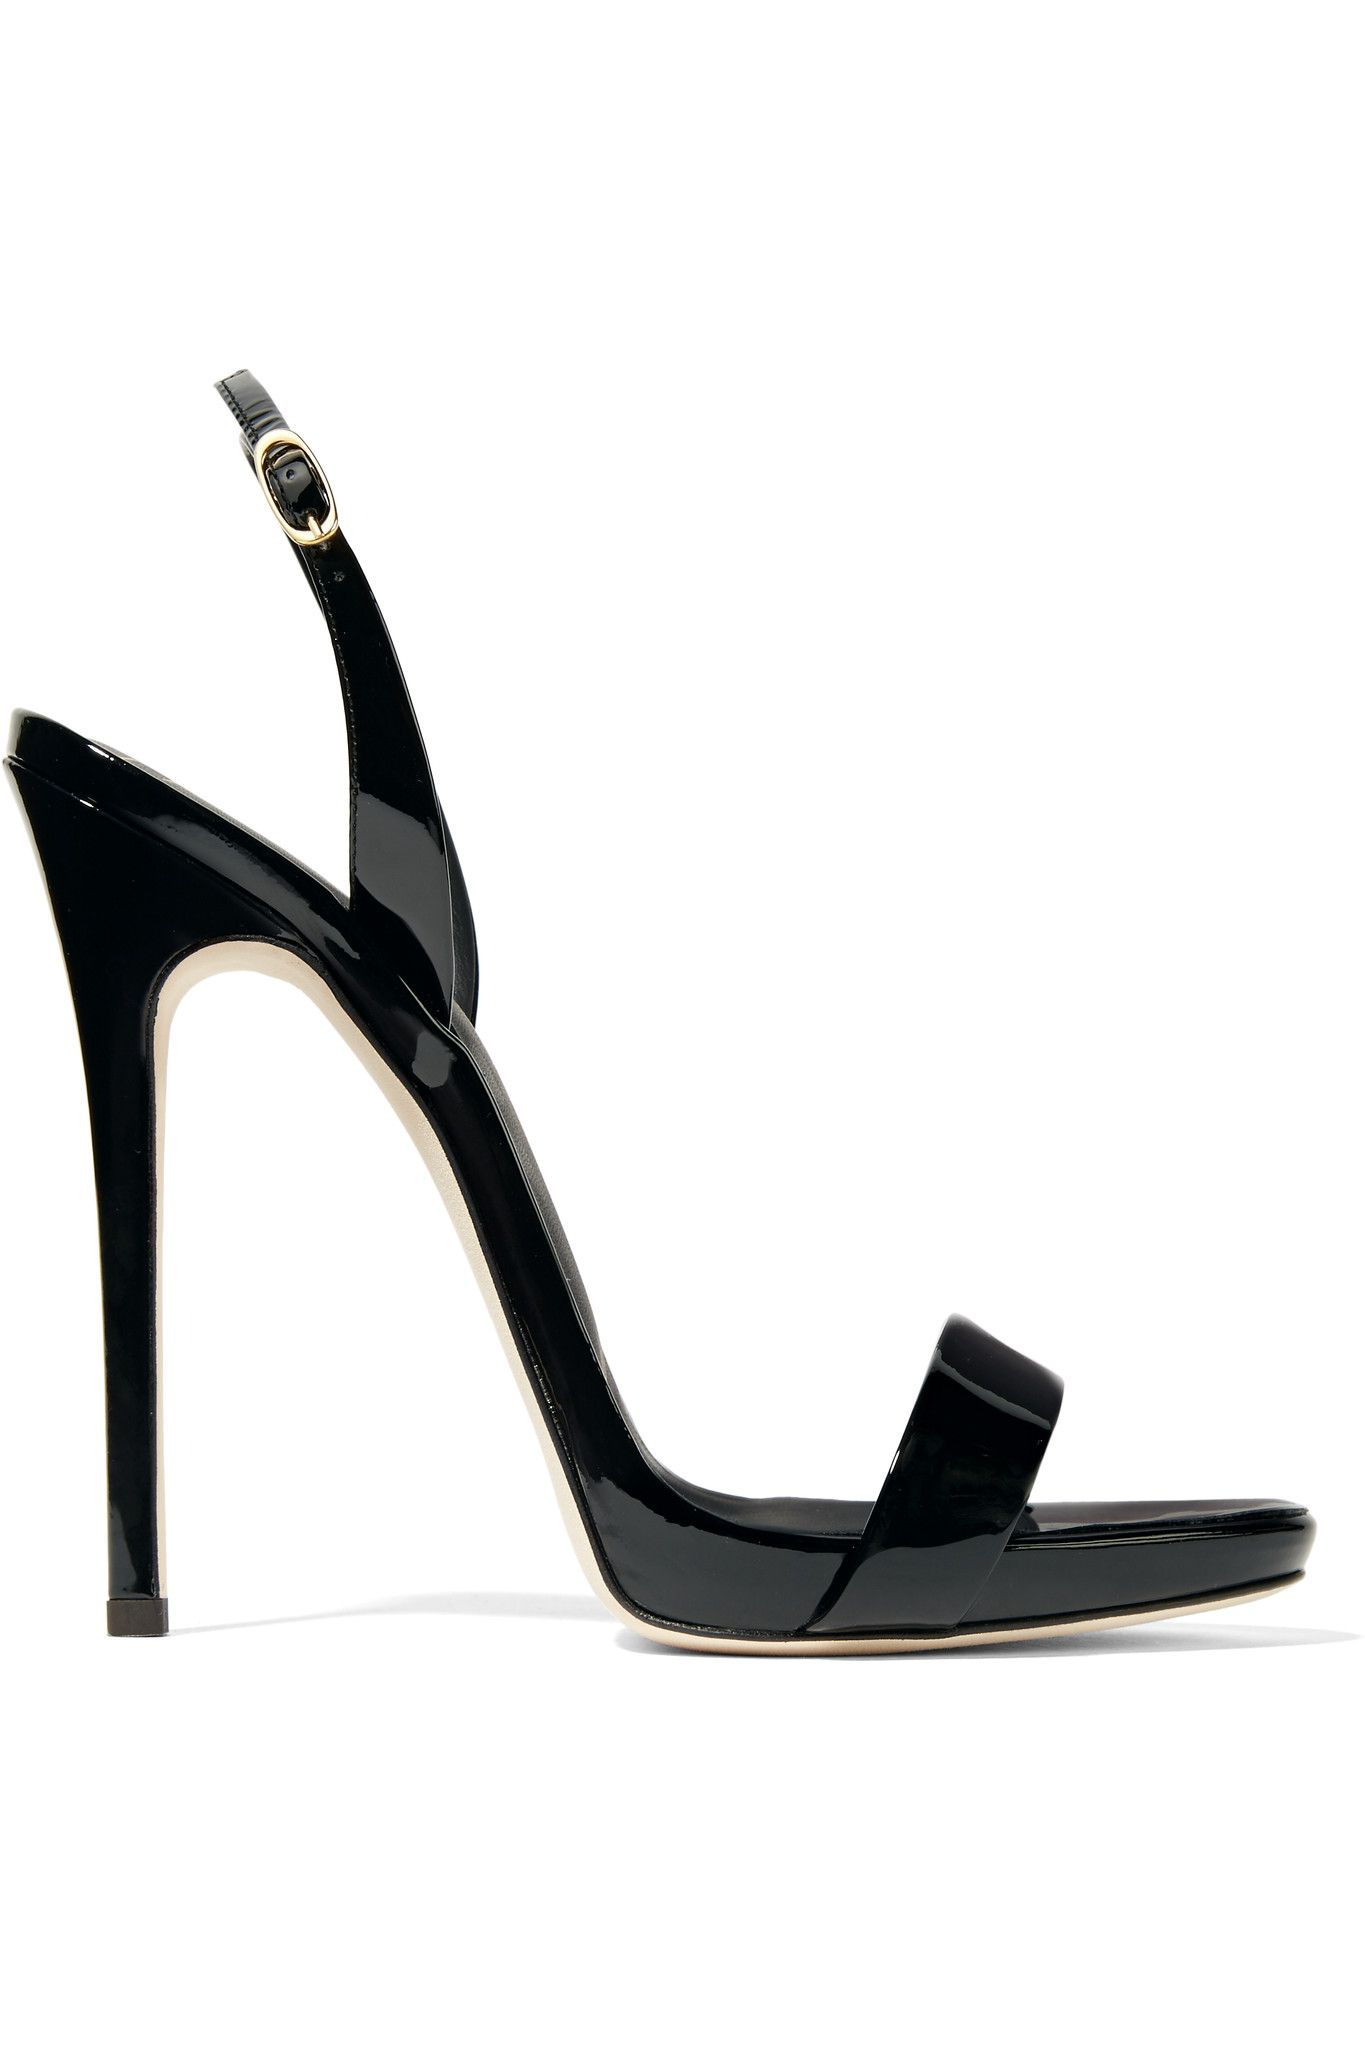 Giuseppe Zanotti Blush patent leather sandal SOPHIE 8VQzg6ddrQ